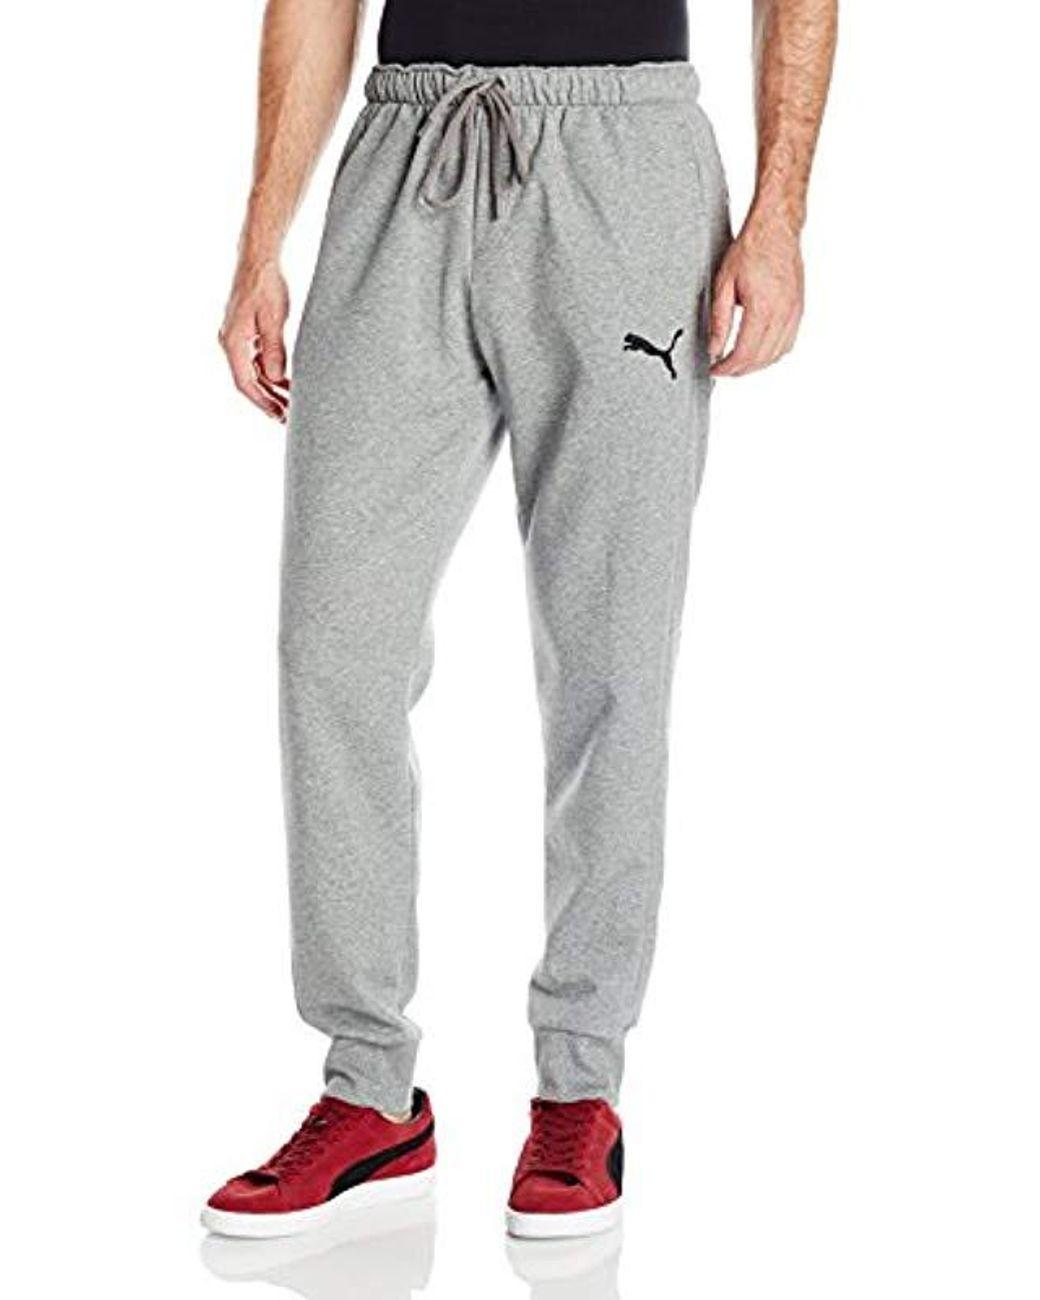 6df20703db469 Men's Gray P48 Core Pants Fleece Cuffed Bottom